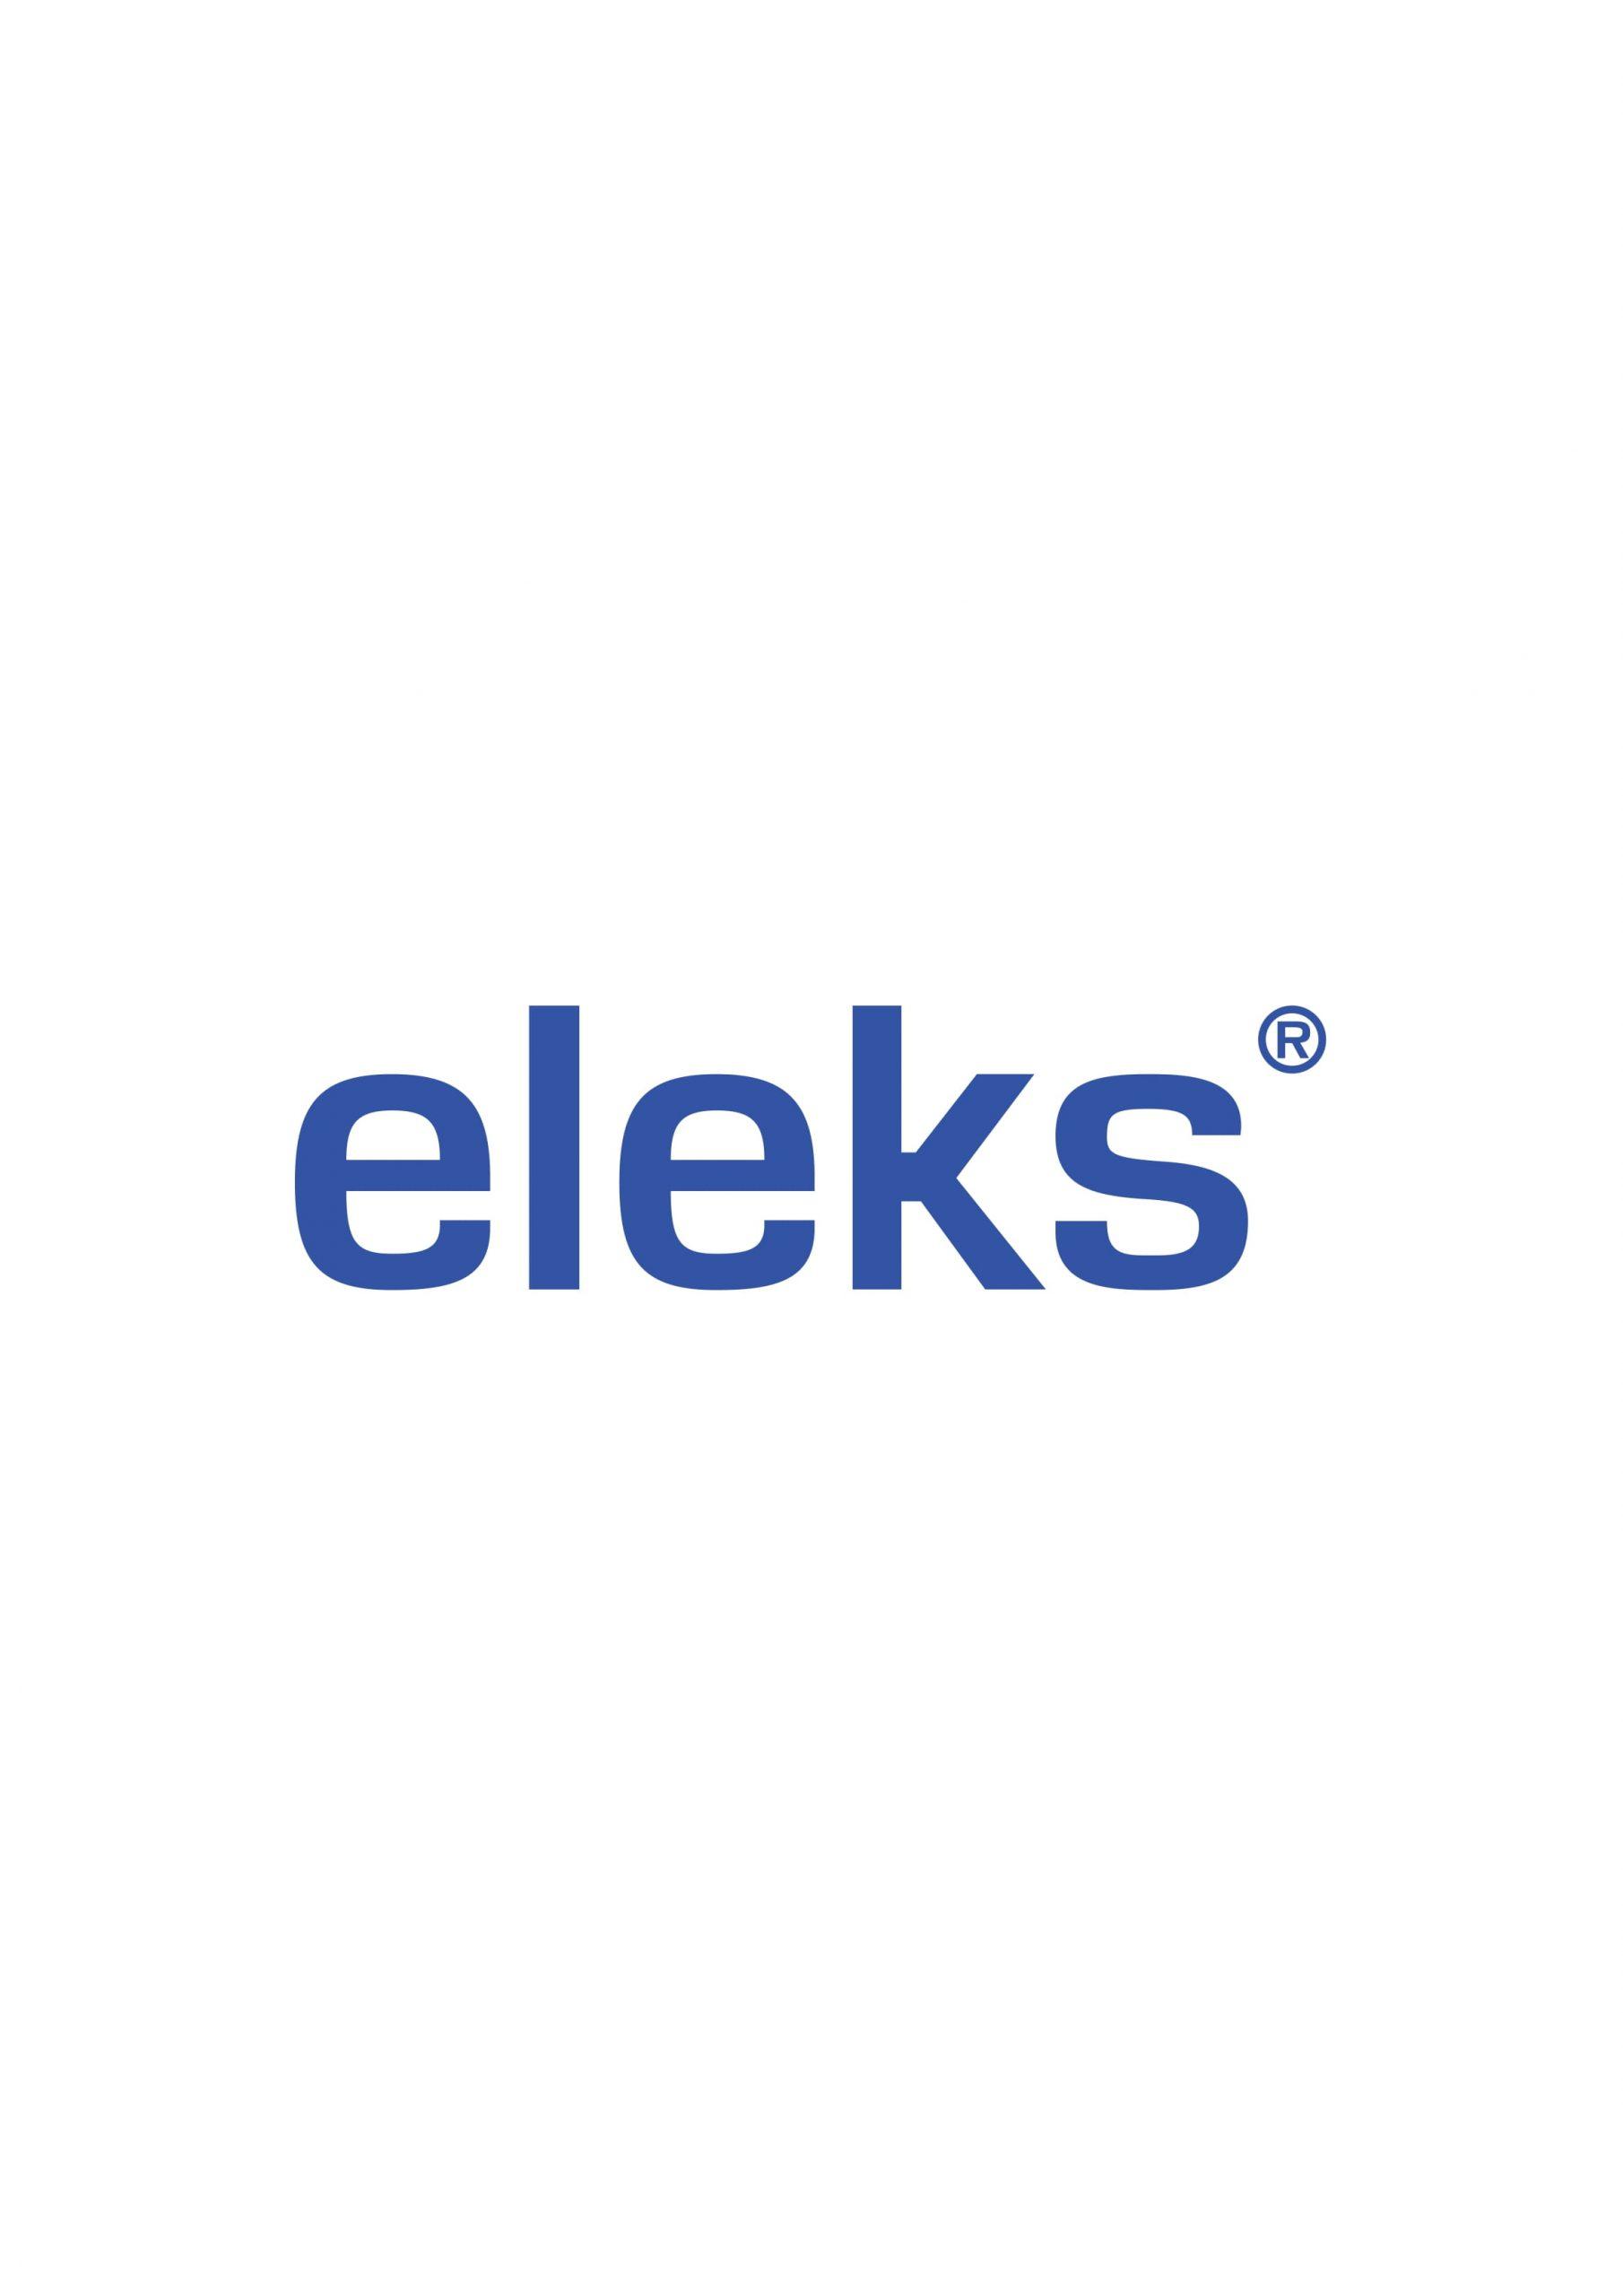 ELEKS_tr_Blue-1